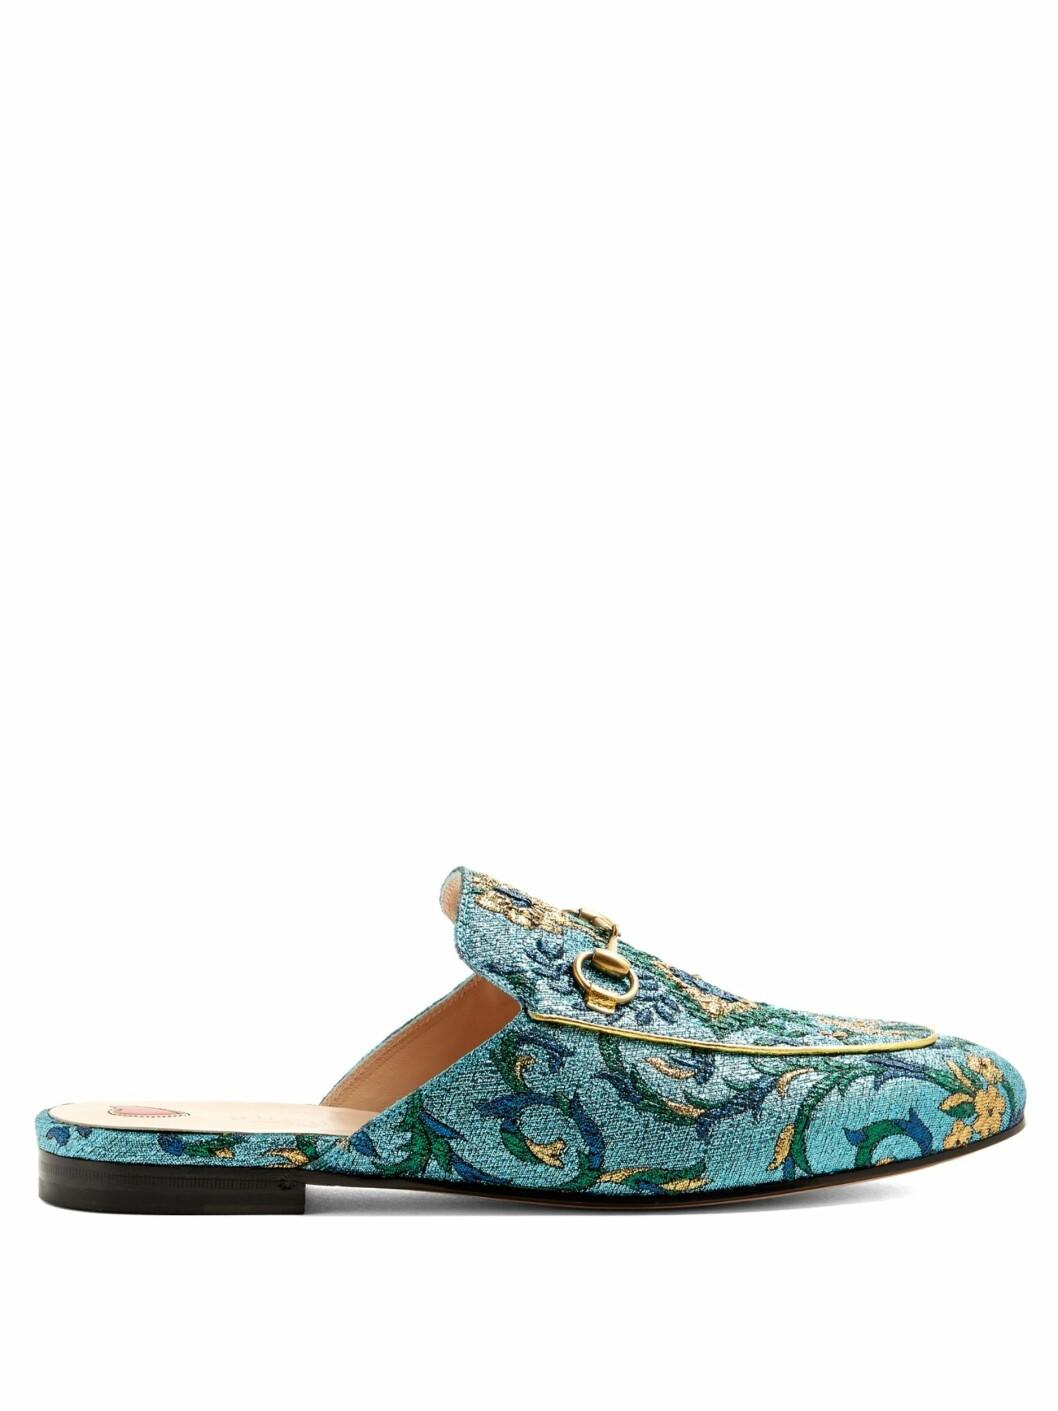 Loafers fra Gucci via Matchesfashion.com |4790,-| https://www.matchesfashion.com/intl/products/Gucci-Princetown-jacquard-backless-loafers--1096002